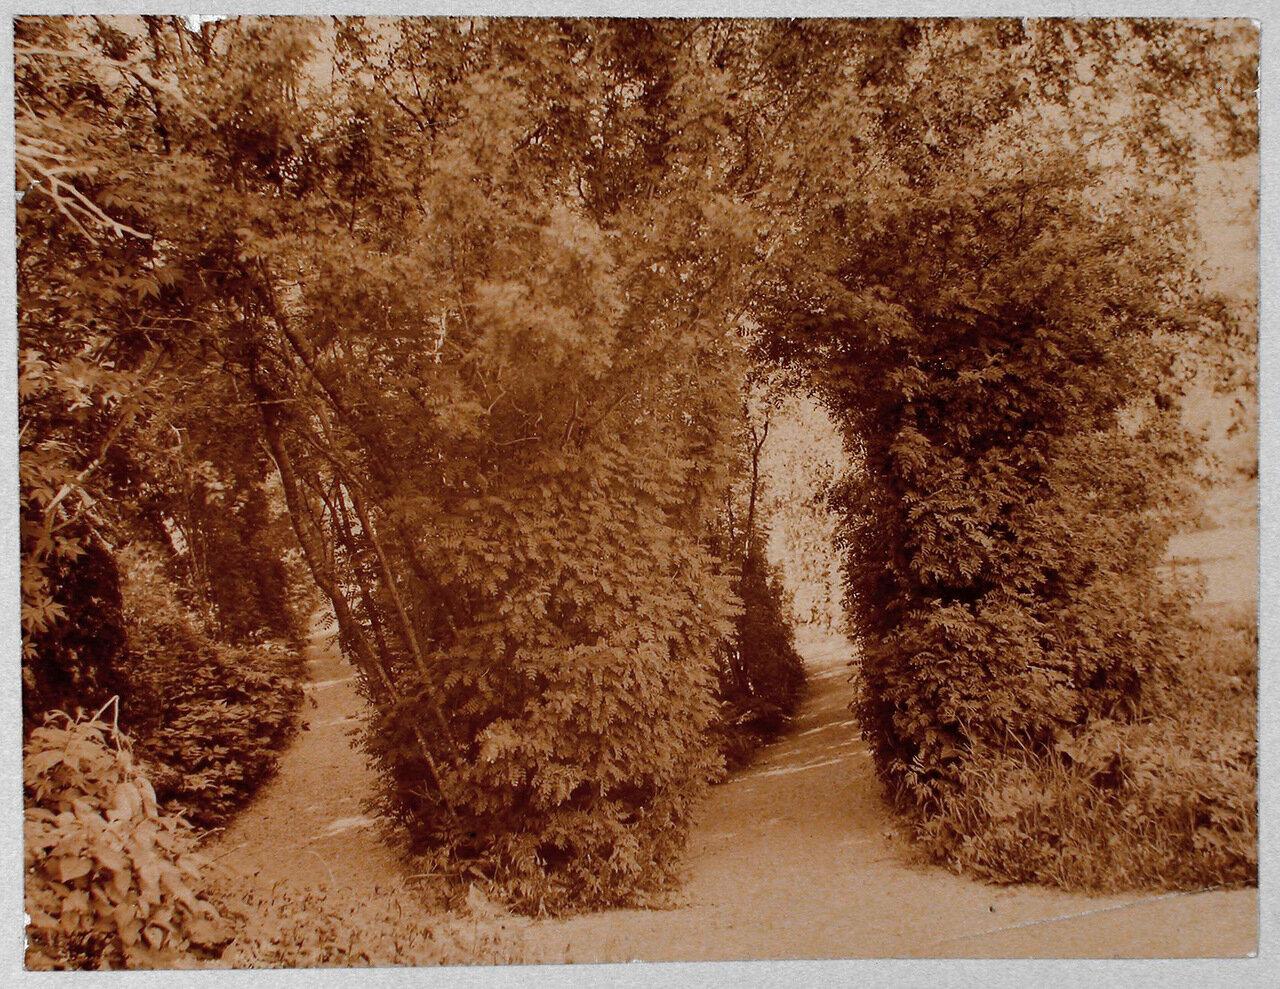 49. Уголок усадебного парка Монрепо